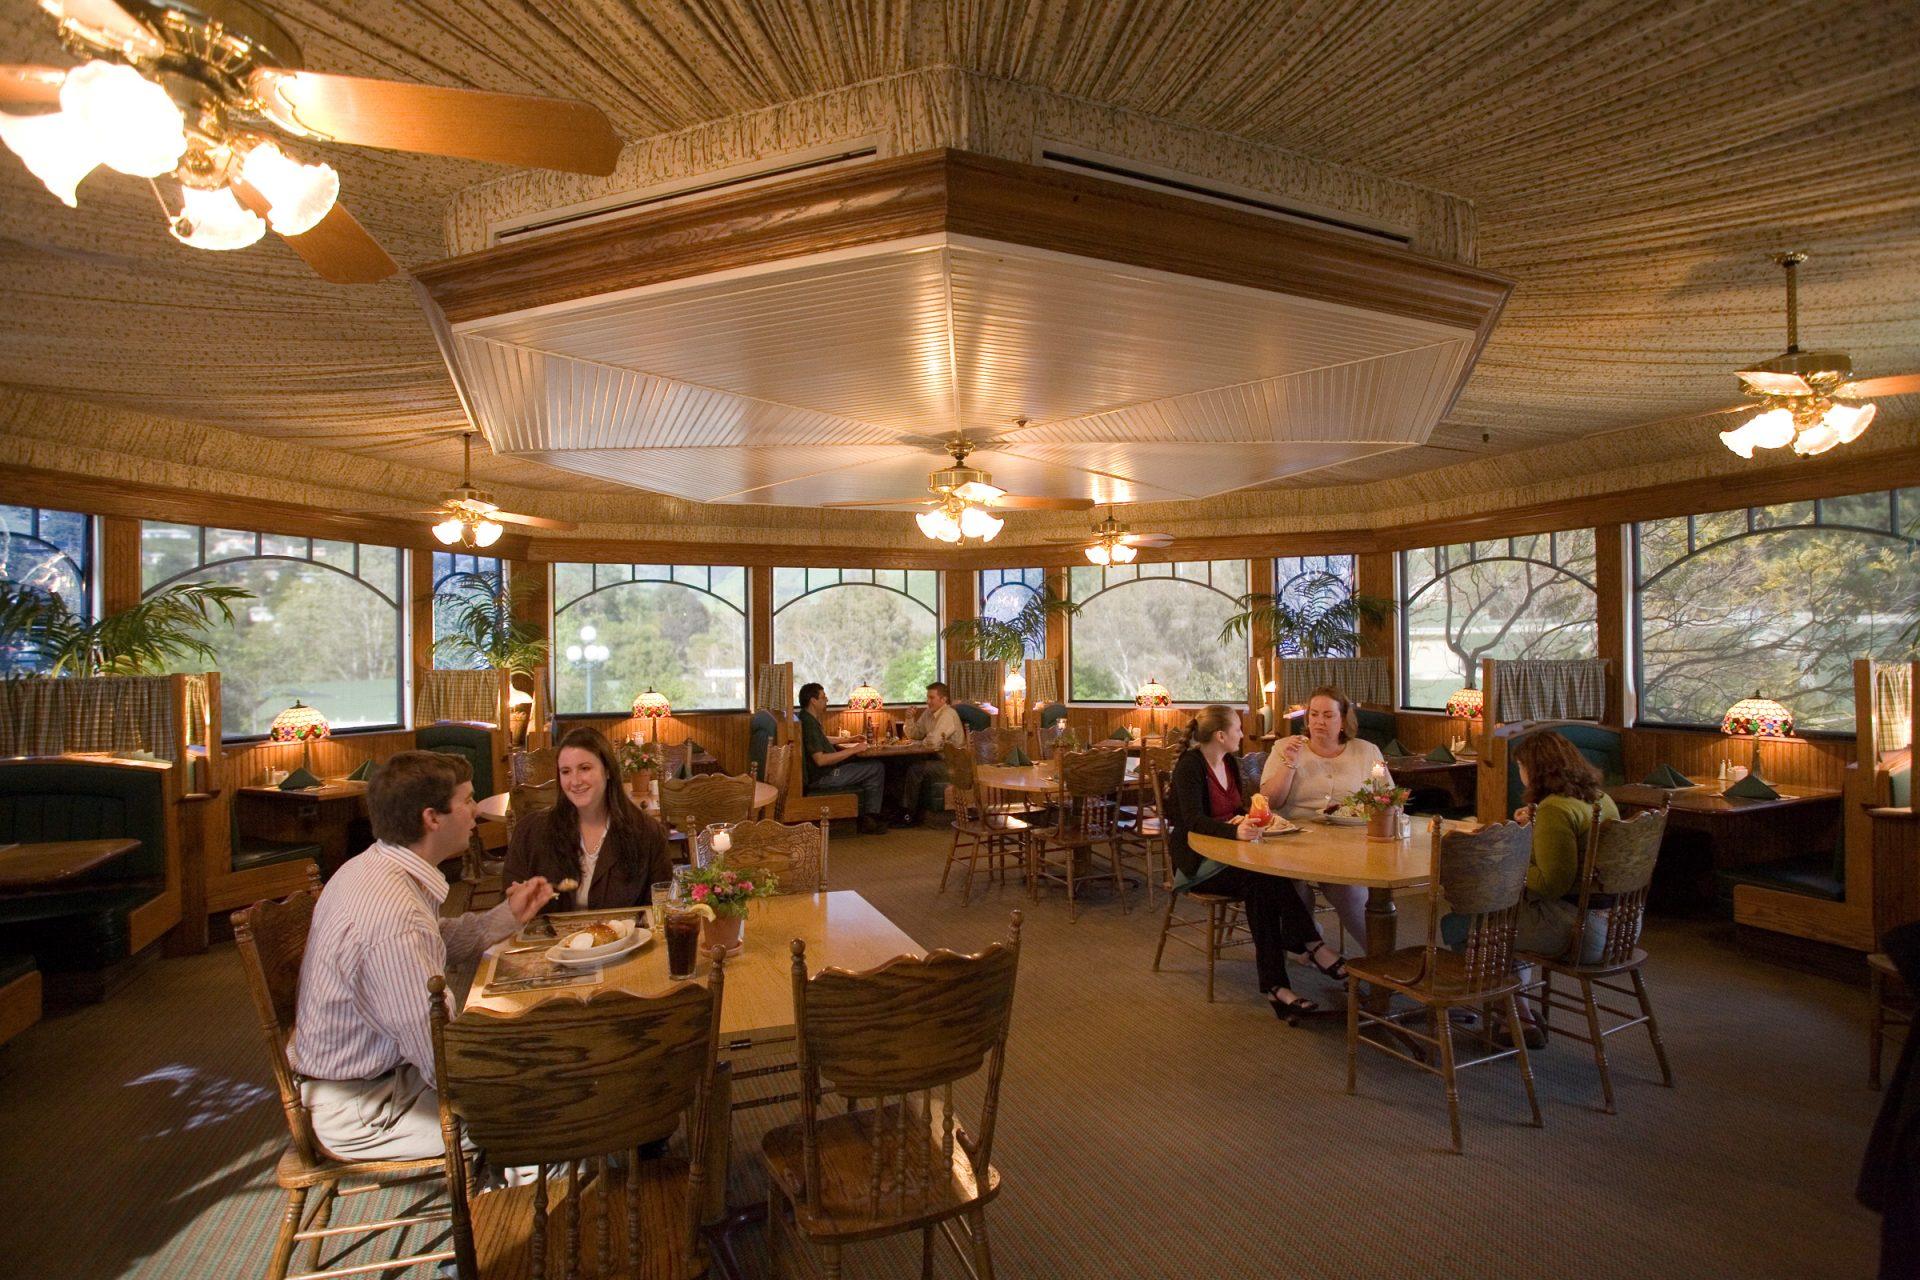 Top 5 Restaurants To Visit During California Restaurant Month In San